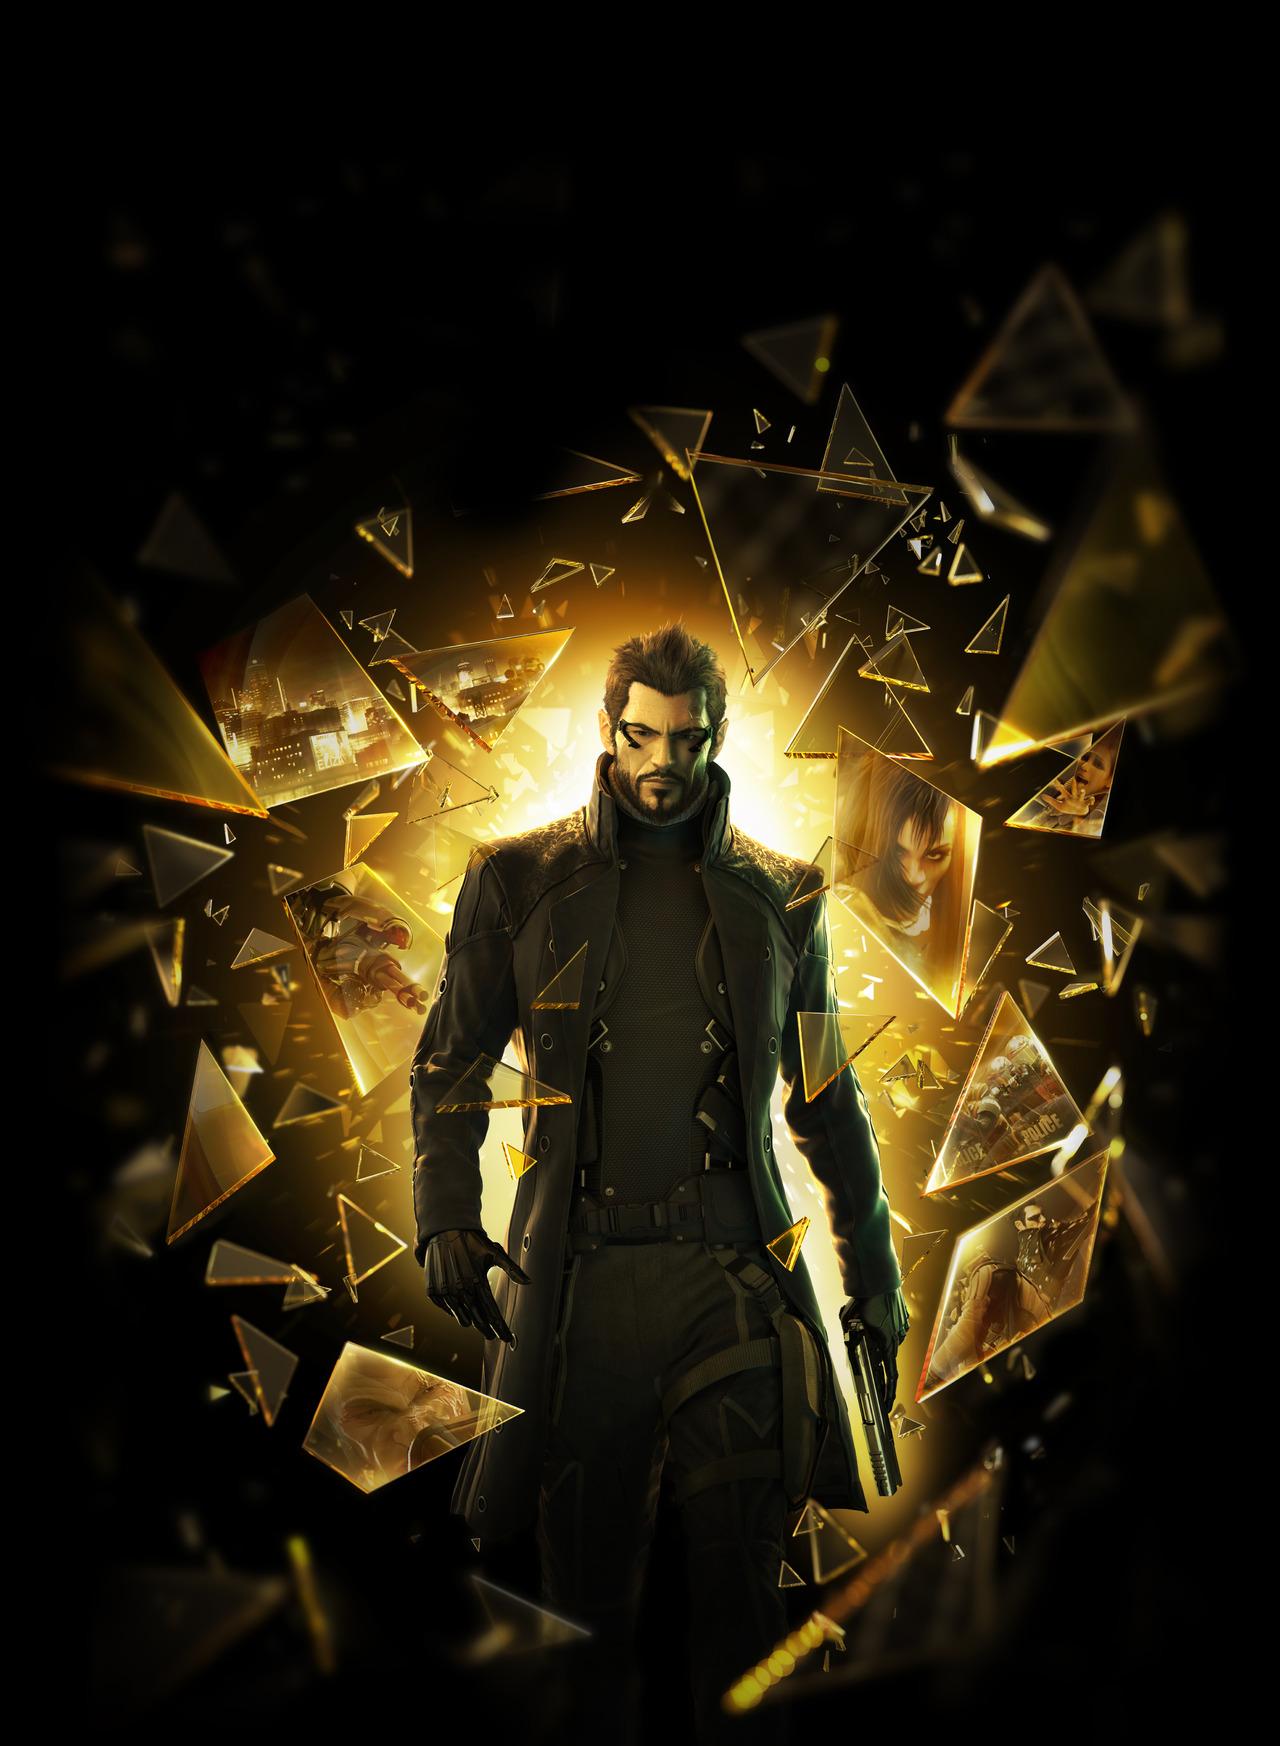 E3 2011 Galerie: Deus Ex: Human Revolution 43924